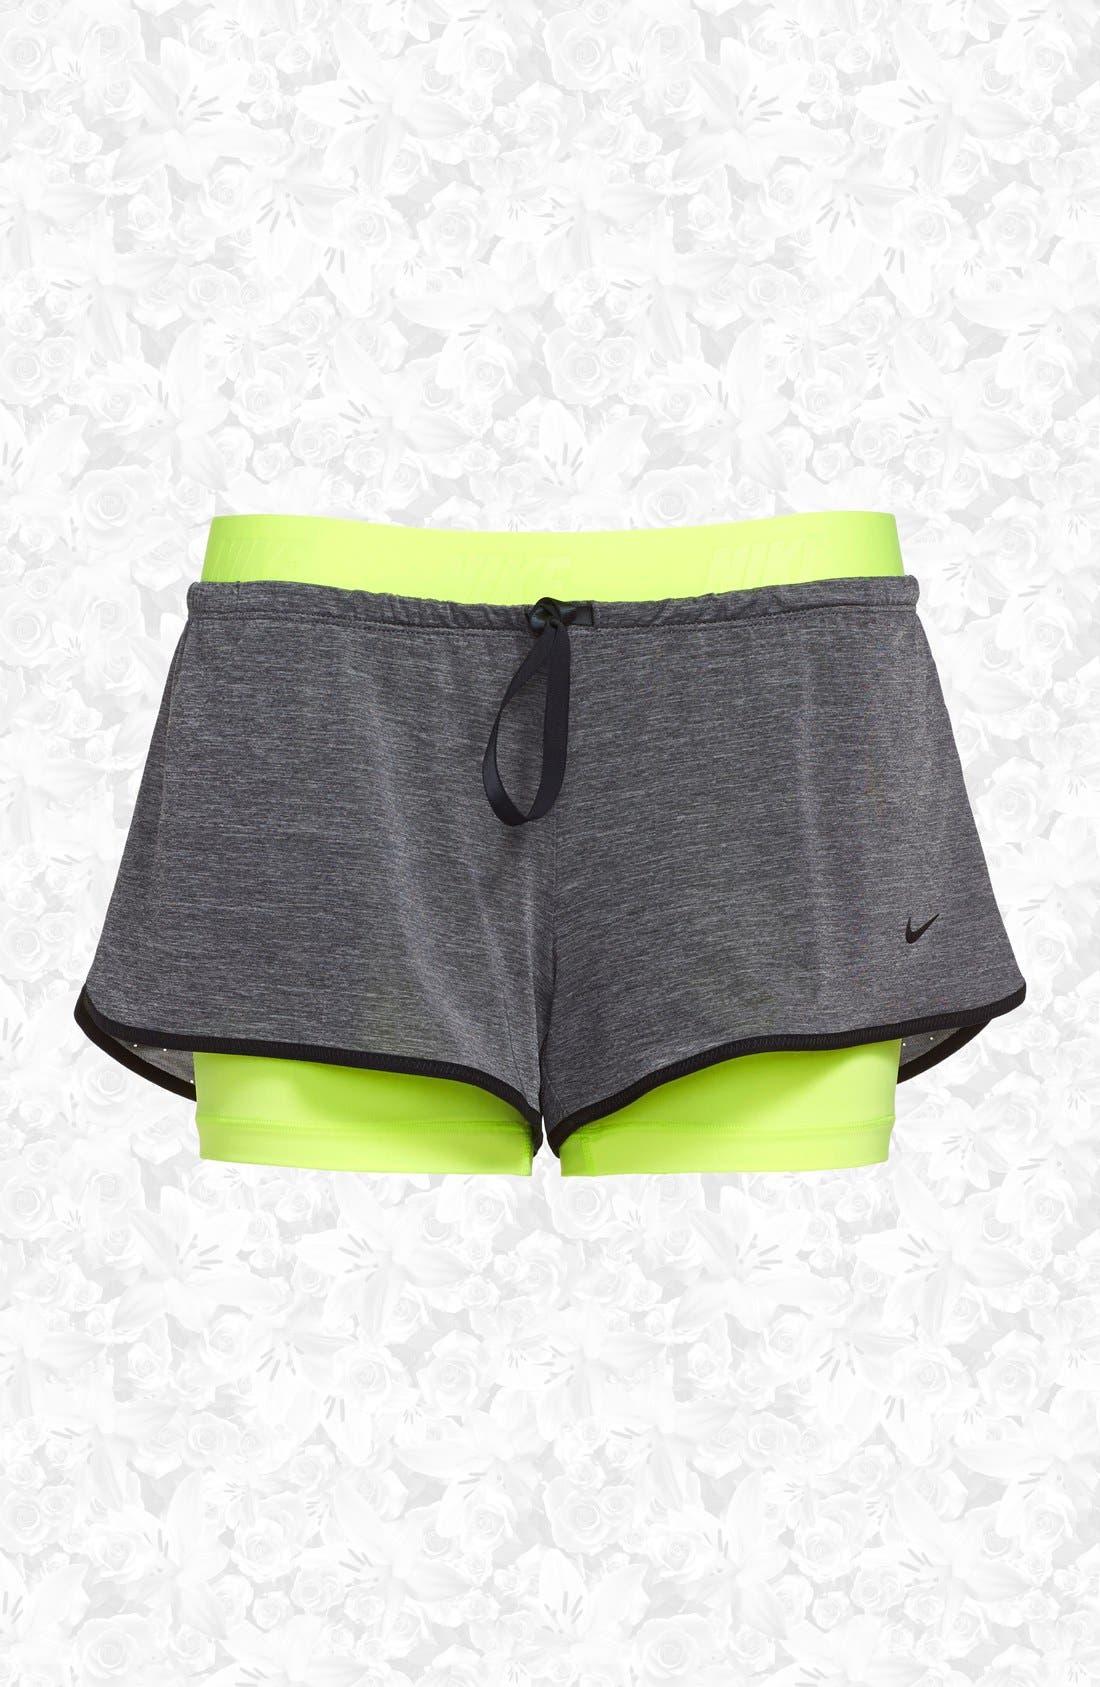 Alternate Image 1 Selected - Nike 'Pro Inside Full Flex' Dri-FIT Training Shorts (Women)